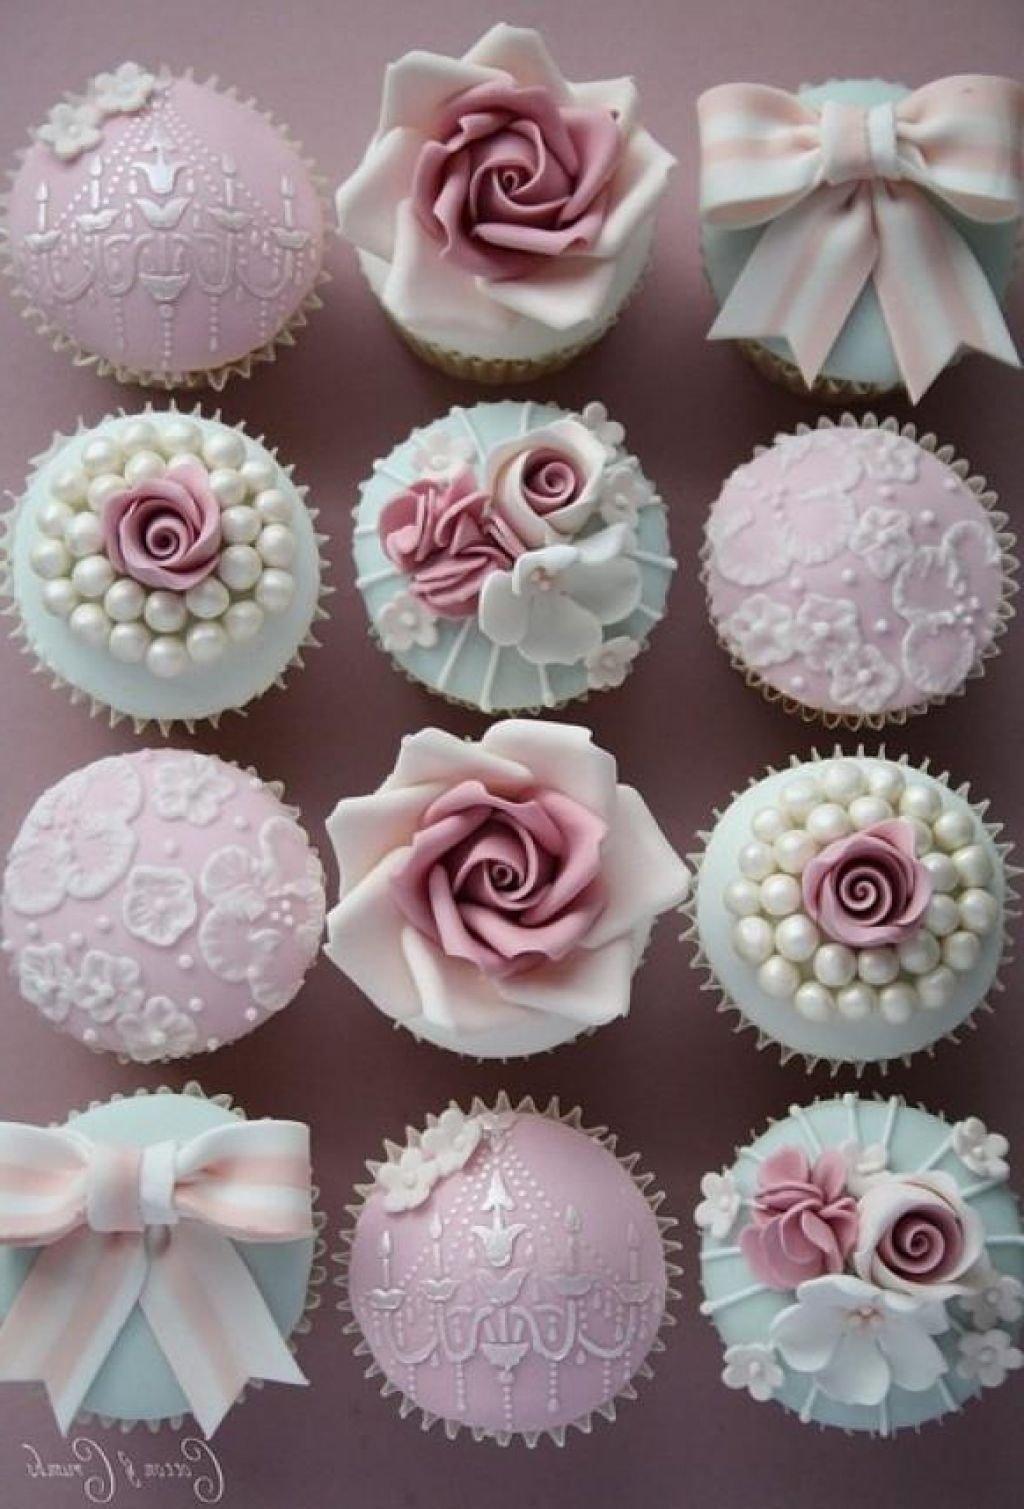 10 Beautiful Cupcake Ideas For Bridal Shower wedding cakes and cupcakes google kereses wedding ideas 2020